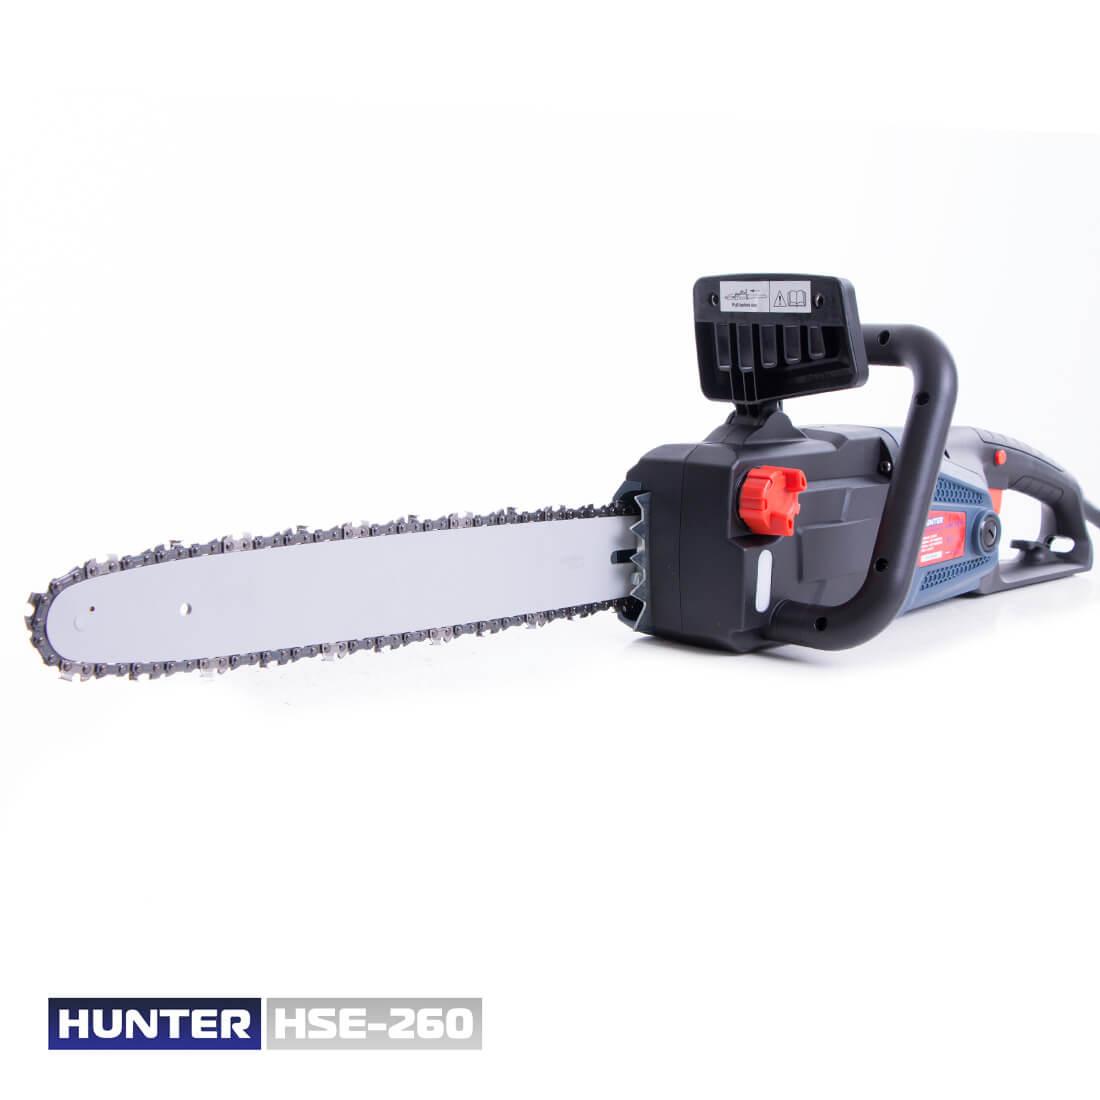 Фото Hunter HSE-280 цена 2700грн №5 — Hunter